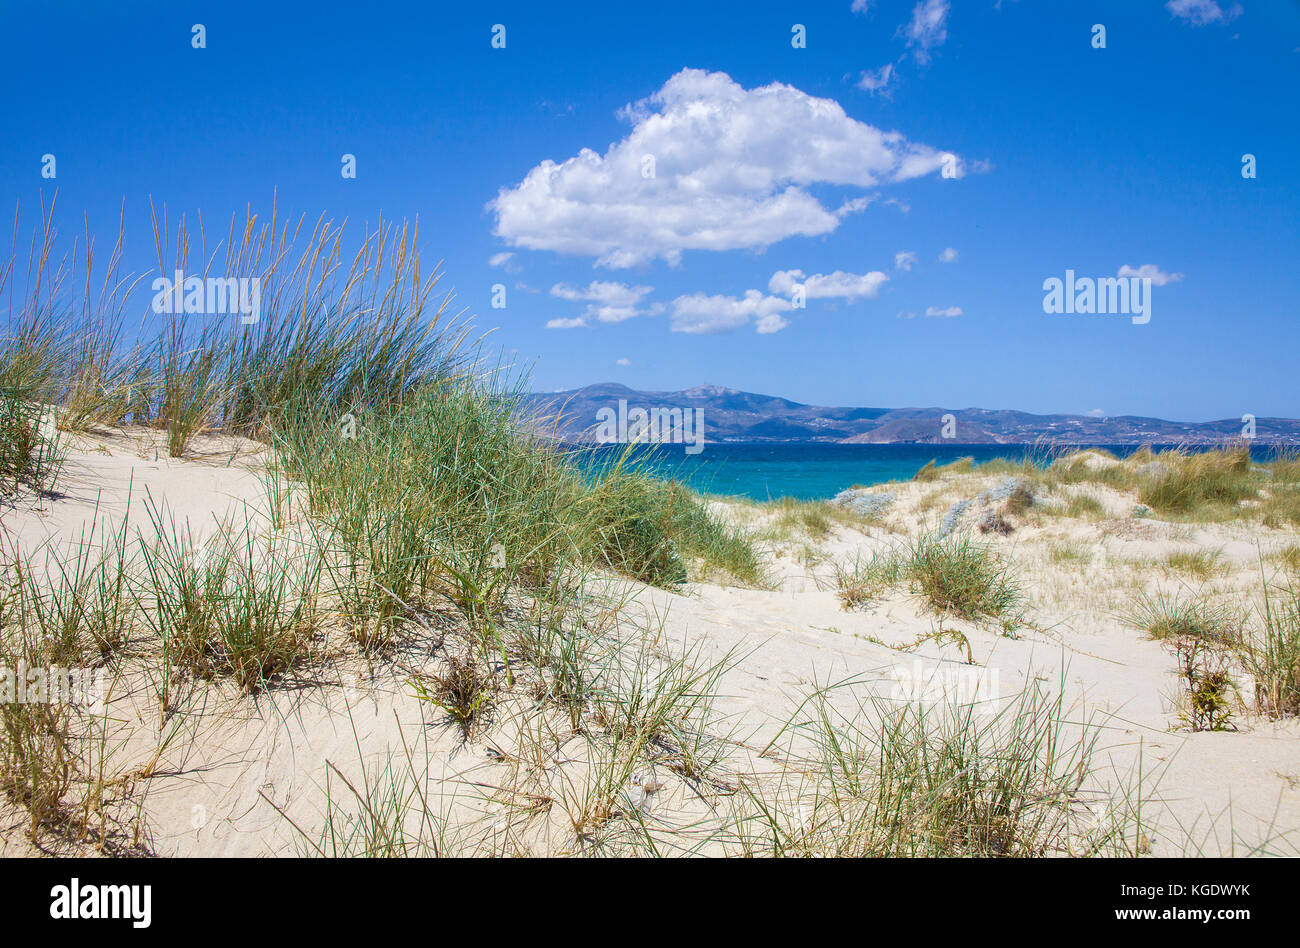 Dunes of Petrivo beach, west side of Naxos island, Cyclades, Aegean, Greece - Stock Image